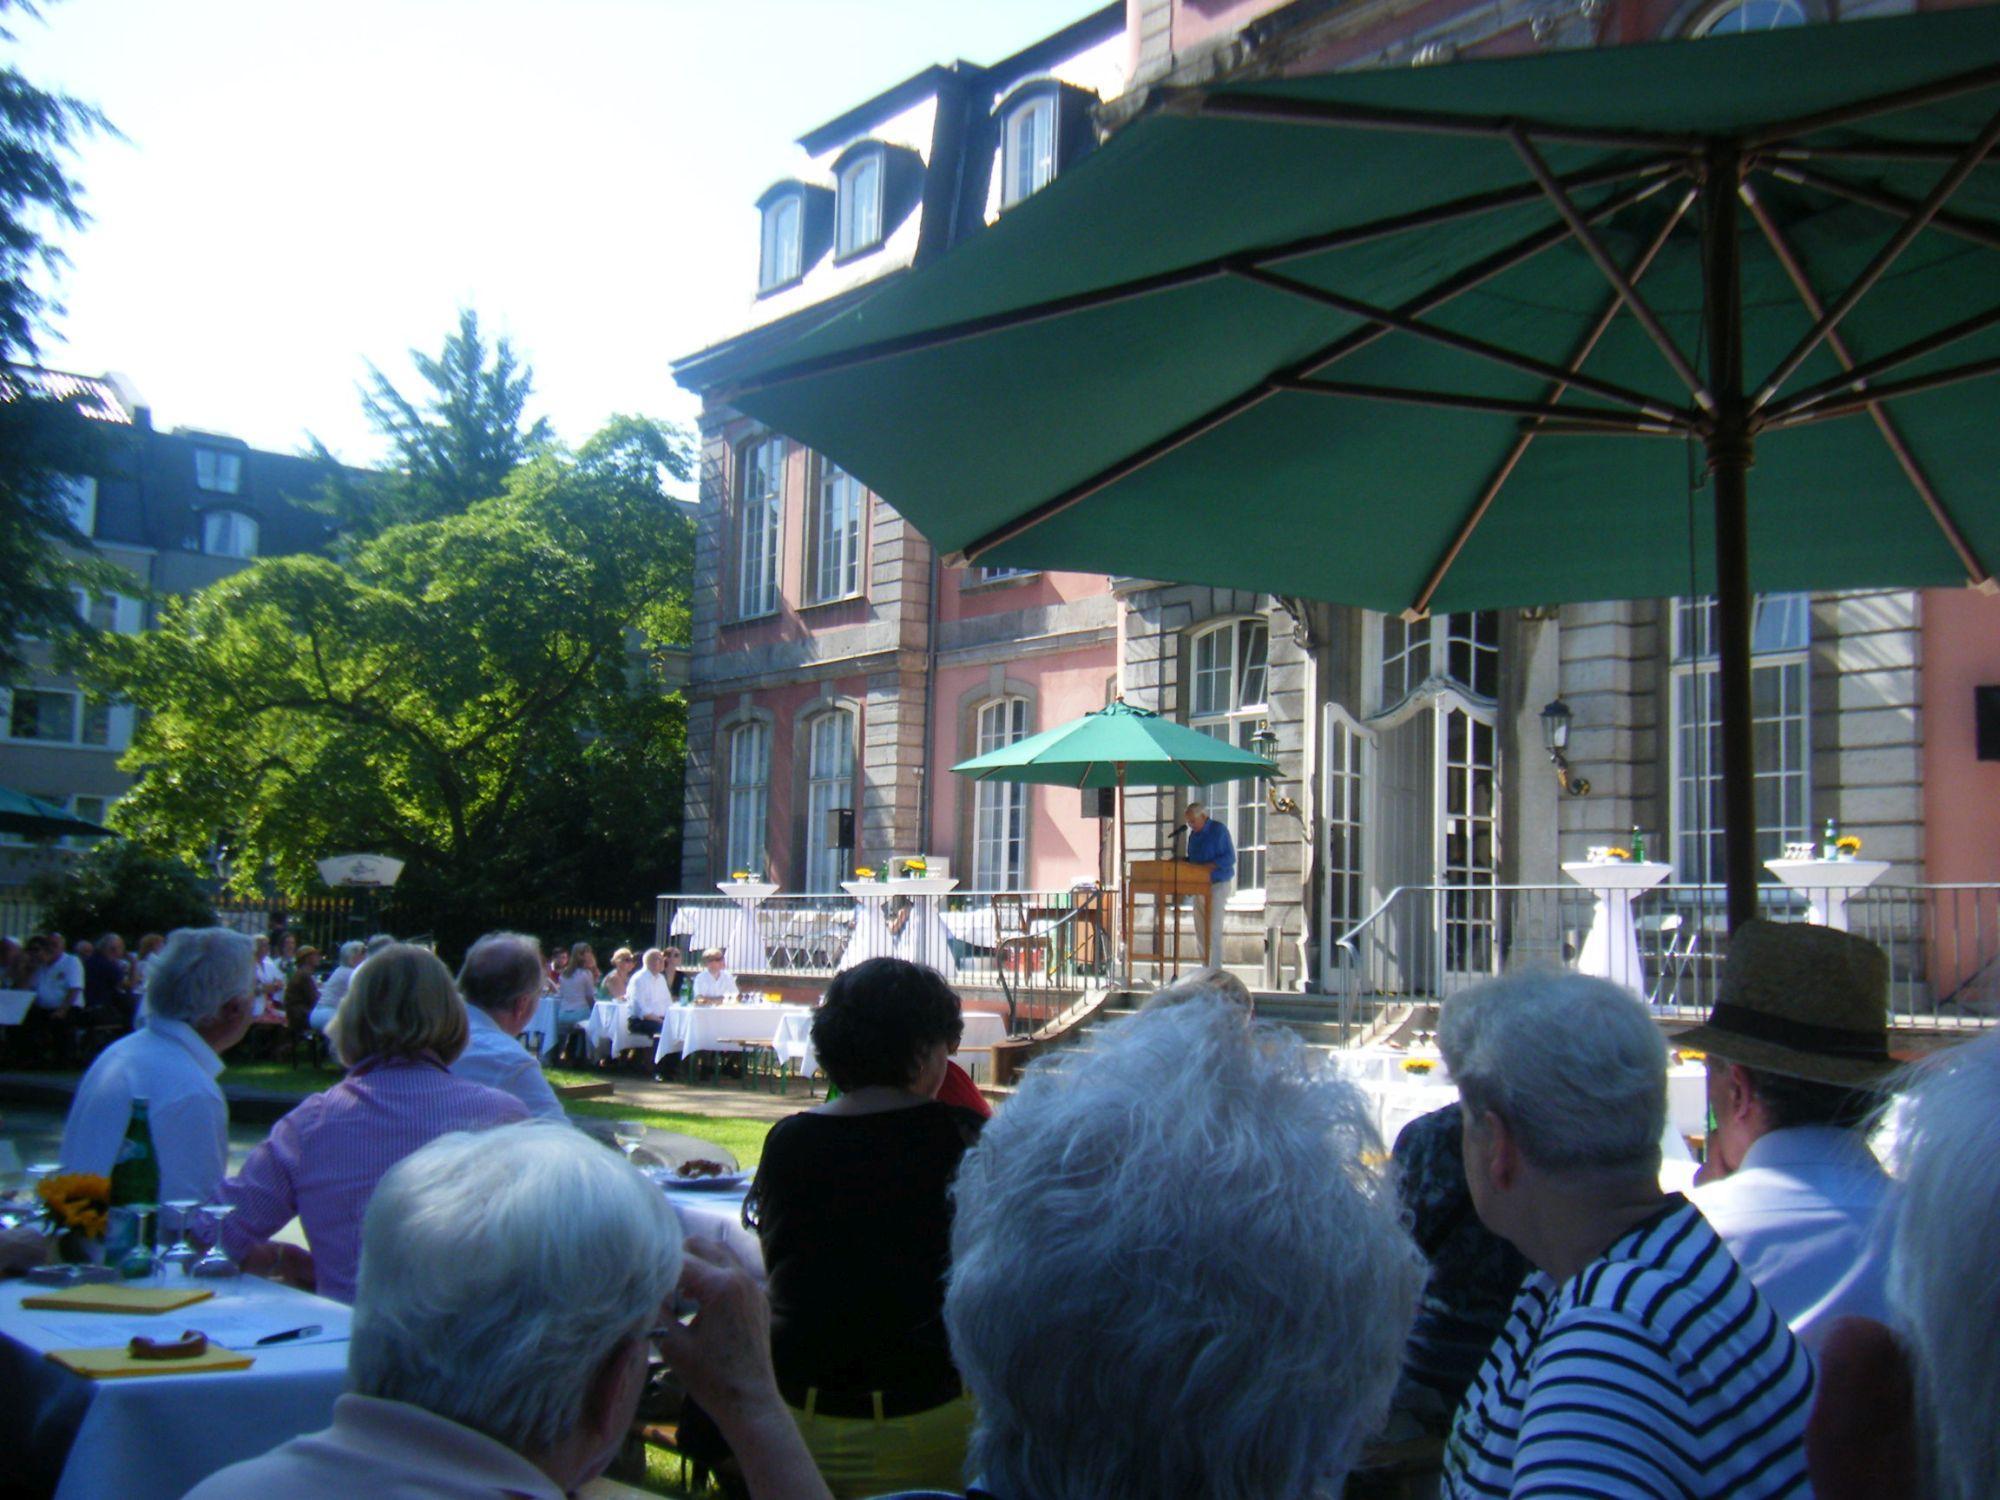 Goethe-Sommerfest im Goethe-Museum/Schloss Jägerhof (c) Goethe-Museum Düsseldorf/Anton-und-Katharina-Kippenberg-Stiftung